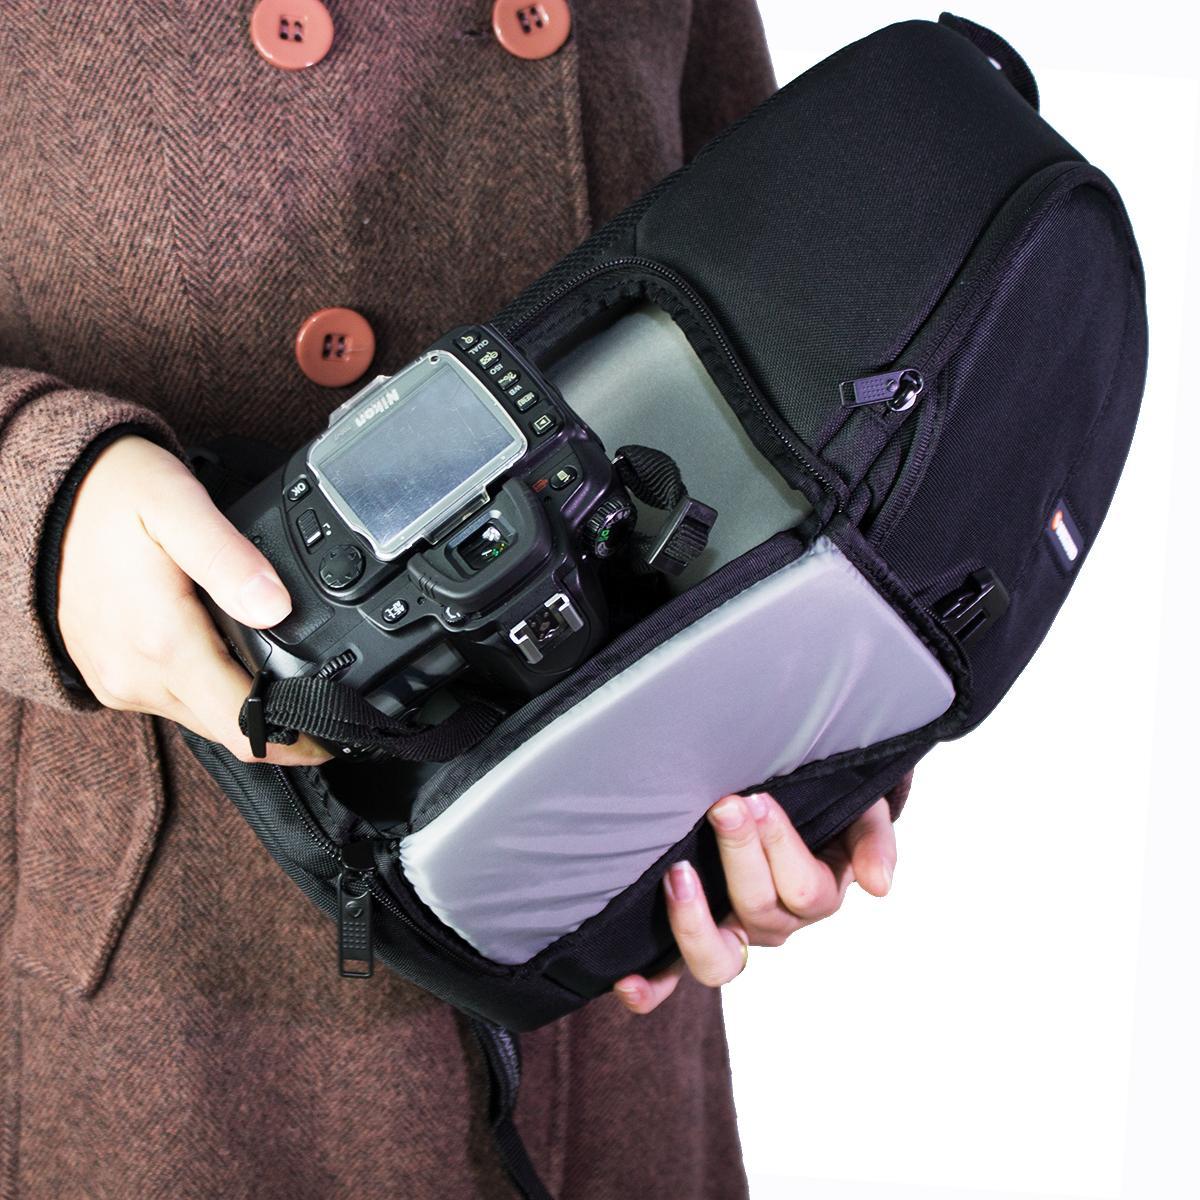 Mochila Vanguard Ziin 47 para Equipamentos Fotográficos